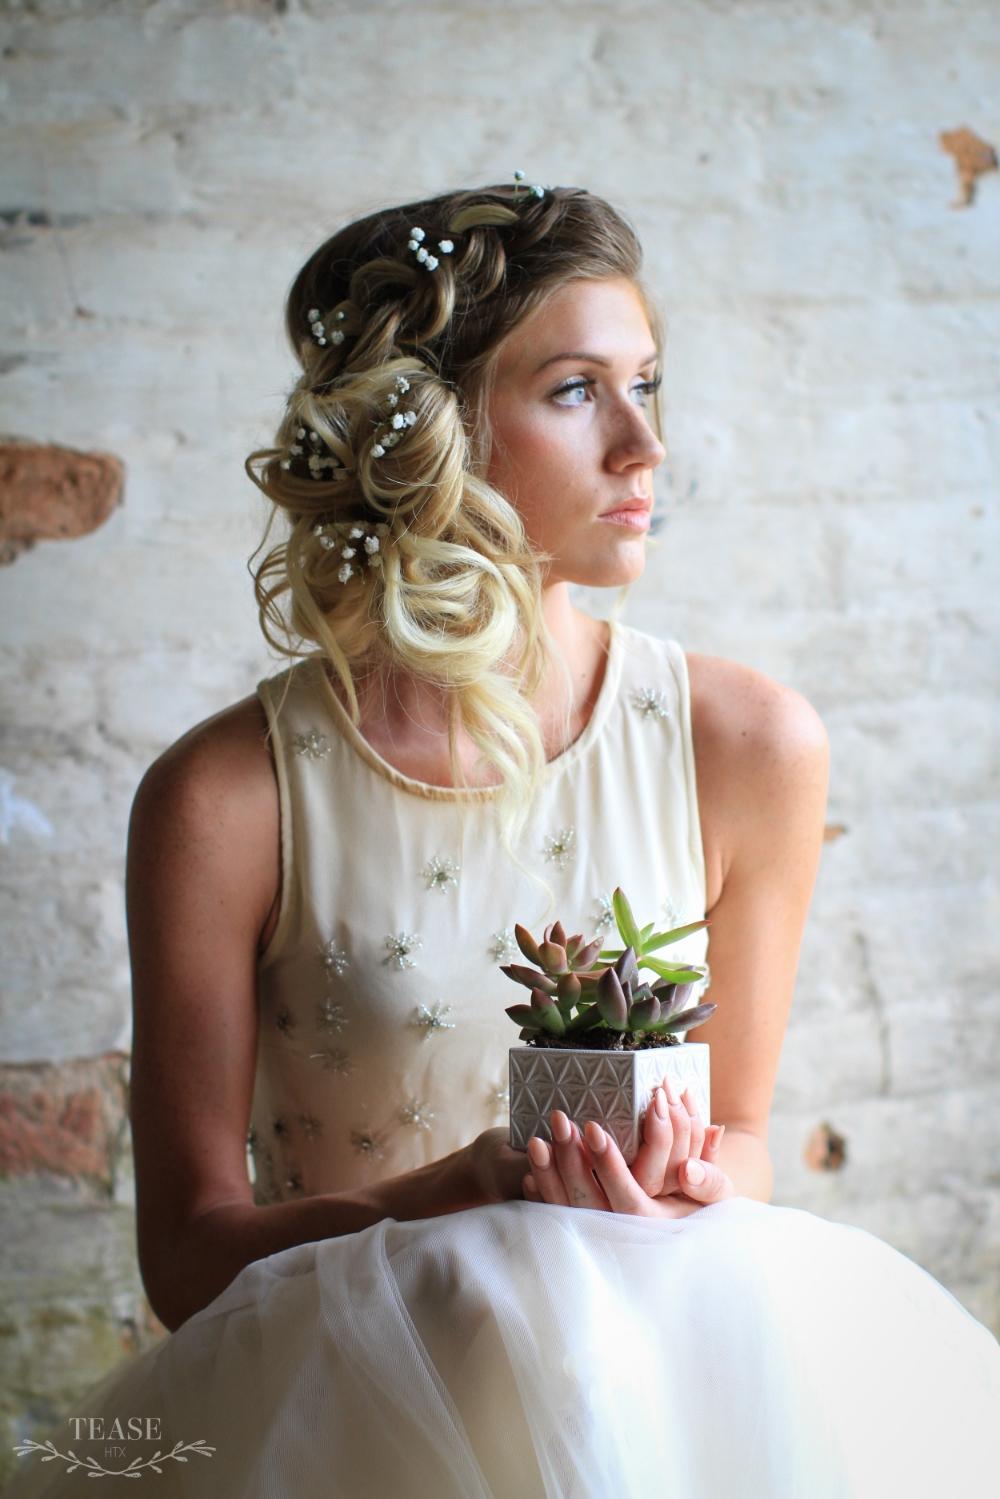 houston-blonde-bridal-updo-braid-concrete-planter.jpg